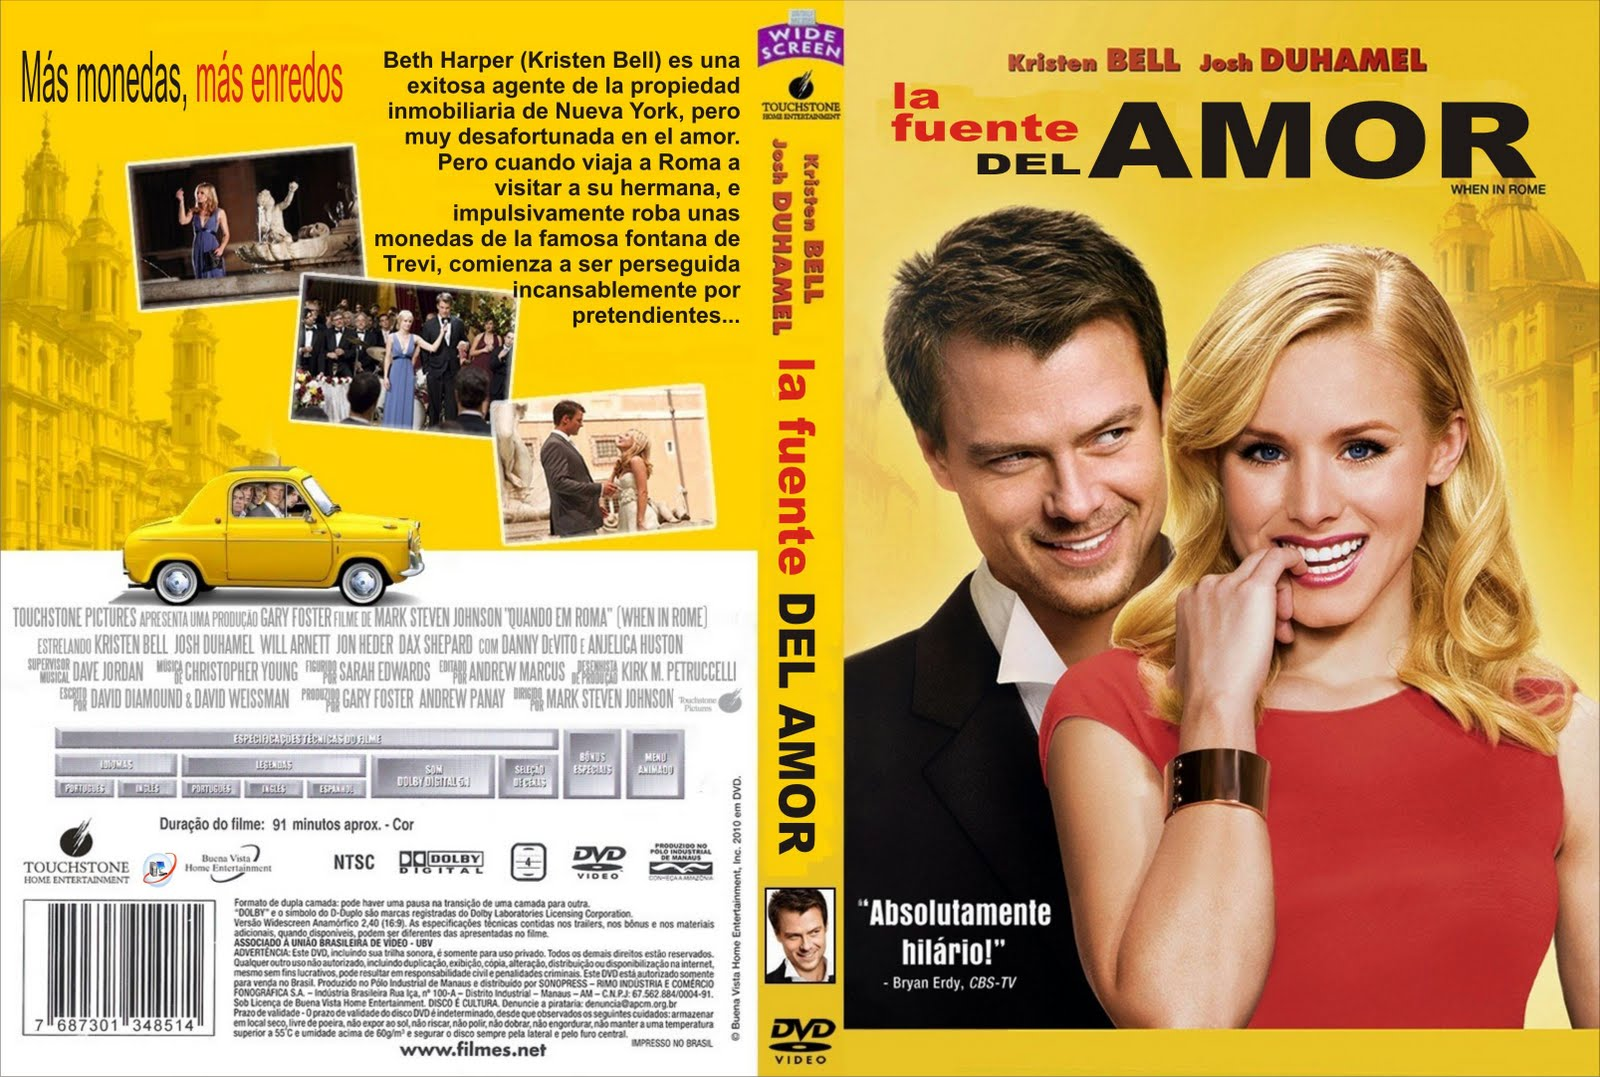 http://2.bp.blogspot.com/_R8FMZIDmtTY/TDx5GIUT7fI/AAAAAAAACtk/kpKBqO_cG74/s1600/La_Fuente_Del_Amor_-_Custom_por_lrplazas_%5Bdvd%5D_80.jpg